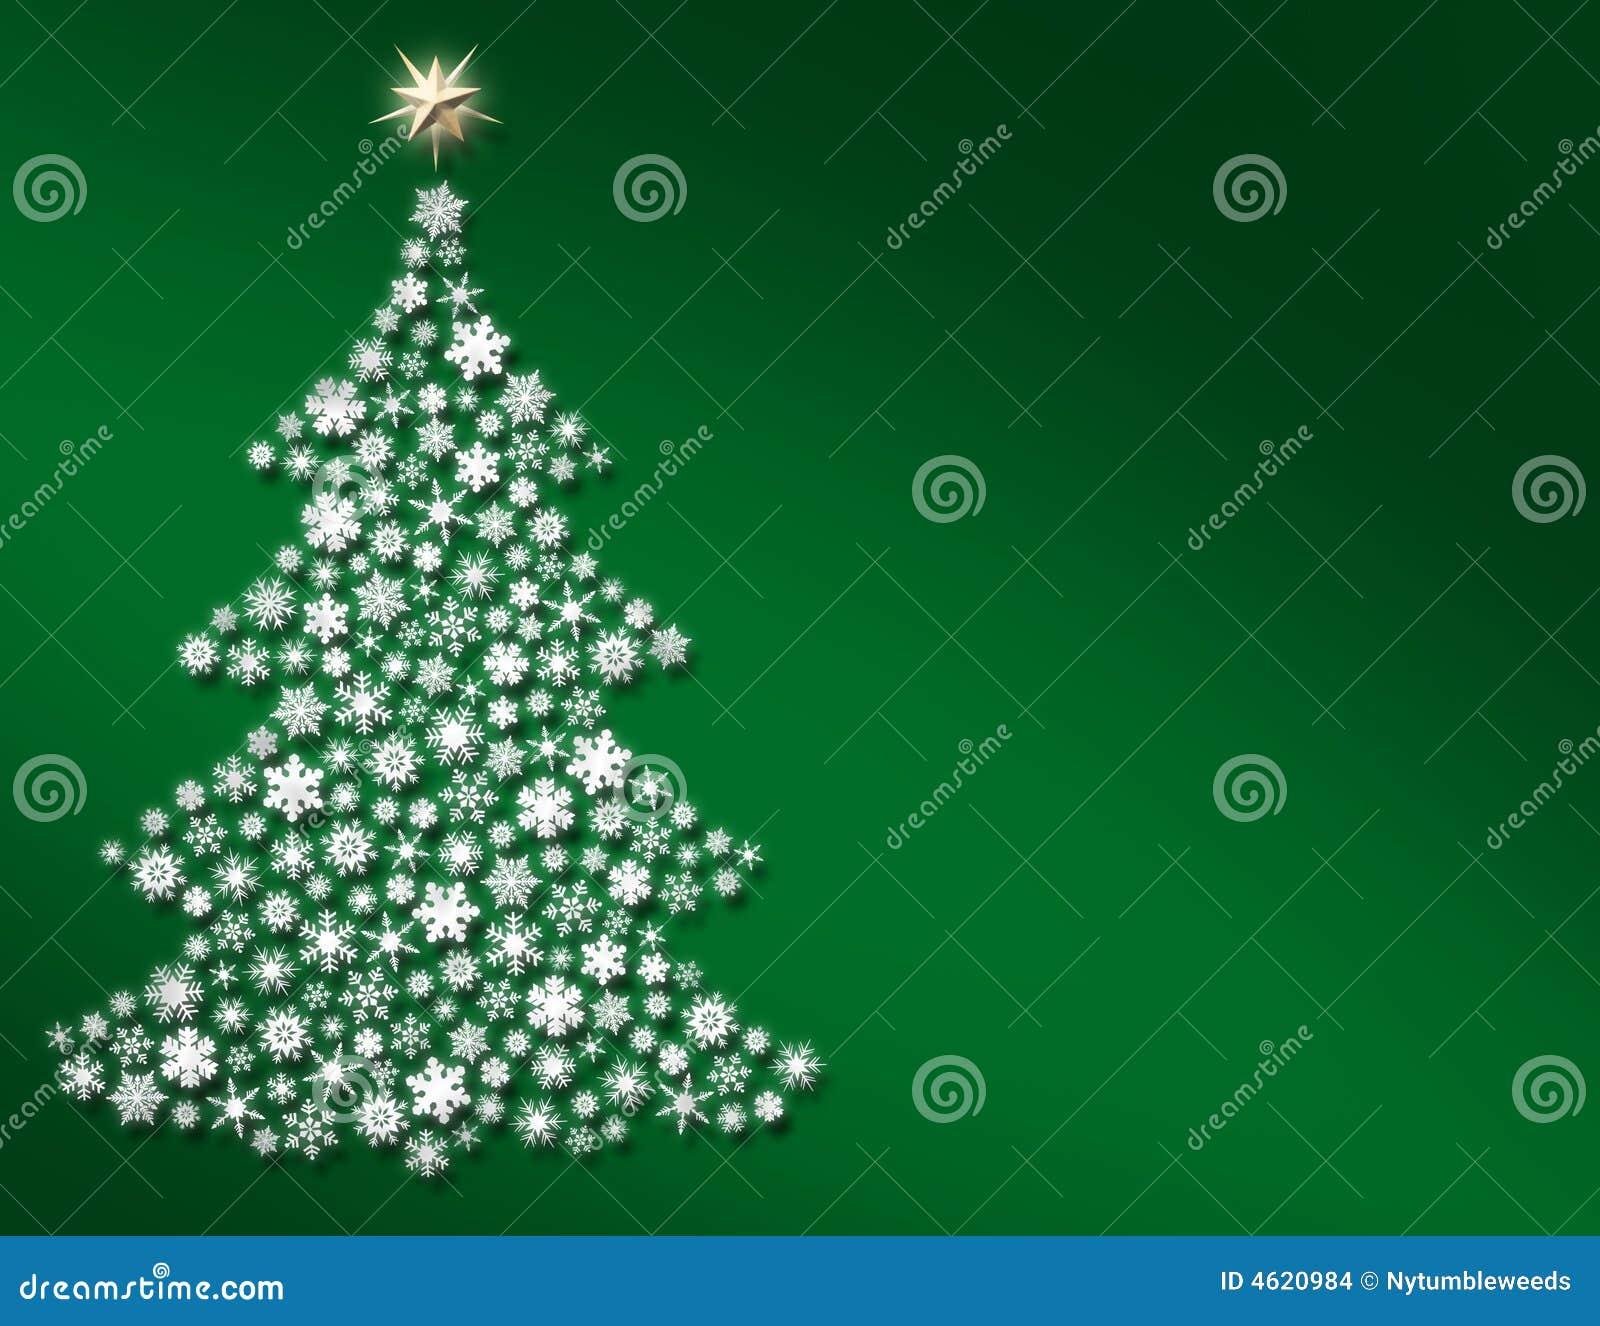 Black Friday Christmas Tree